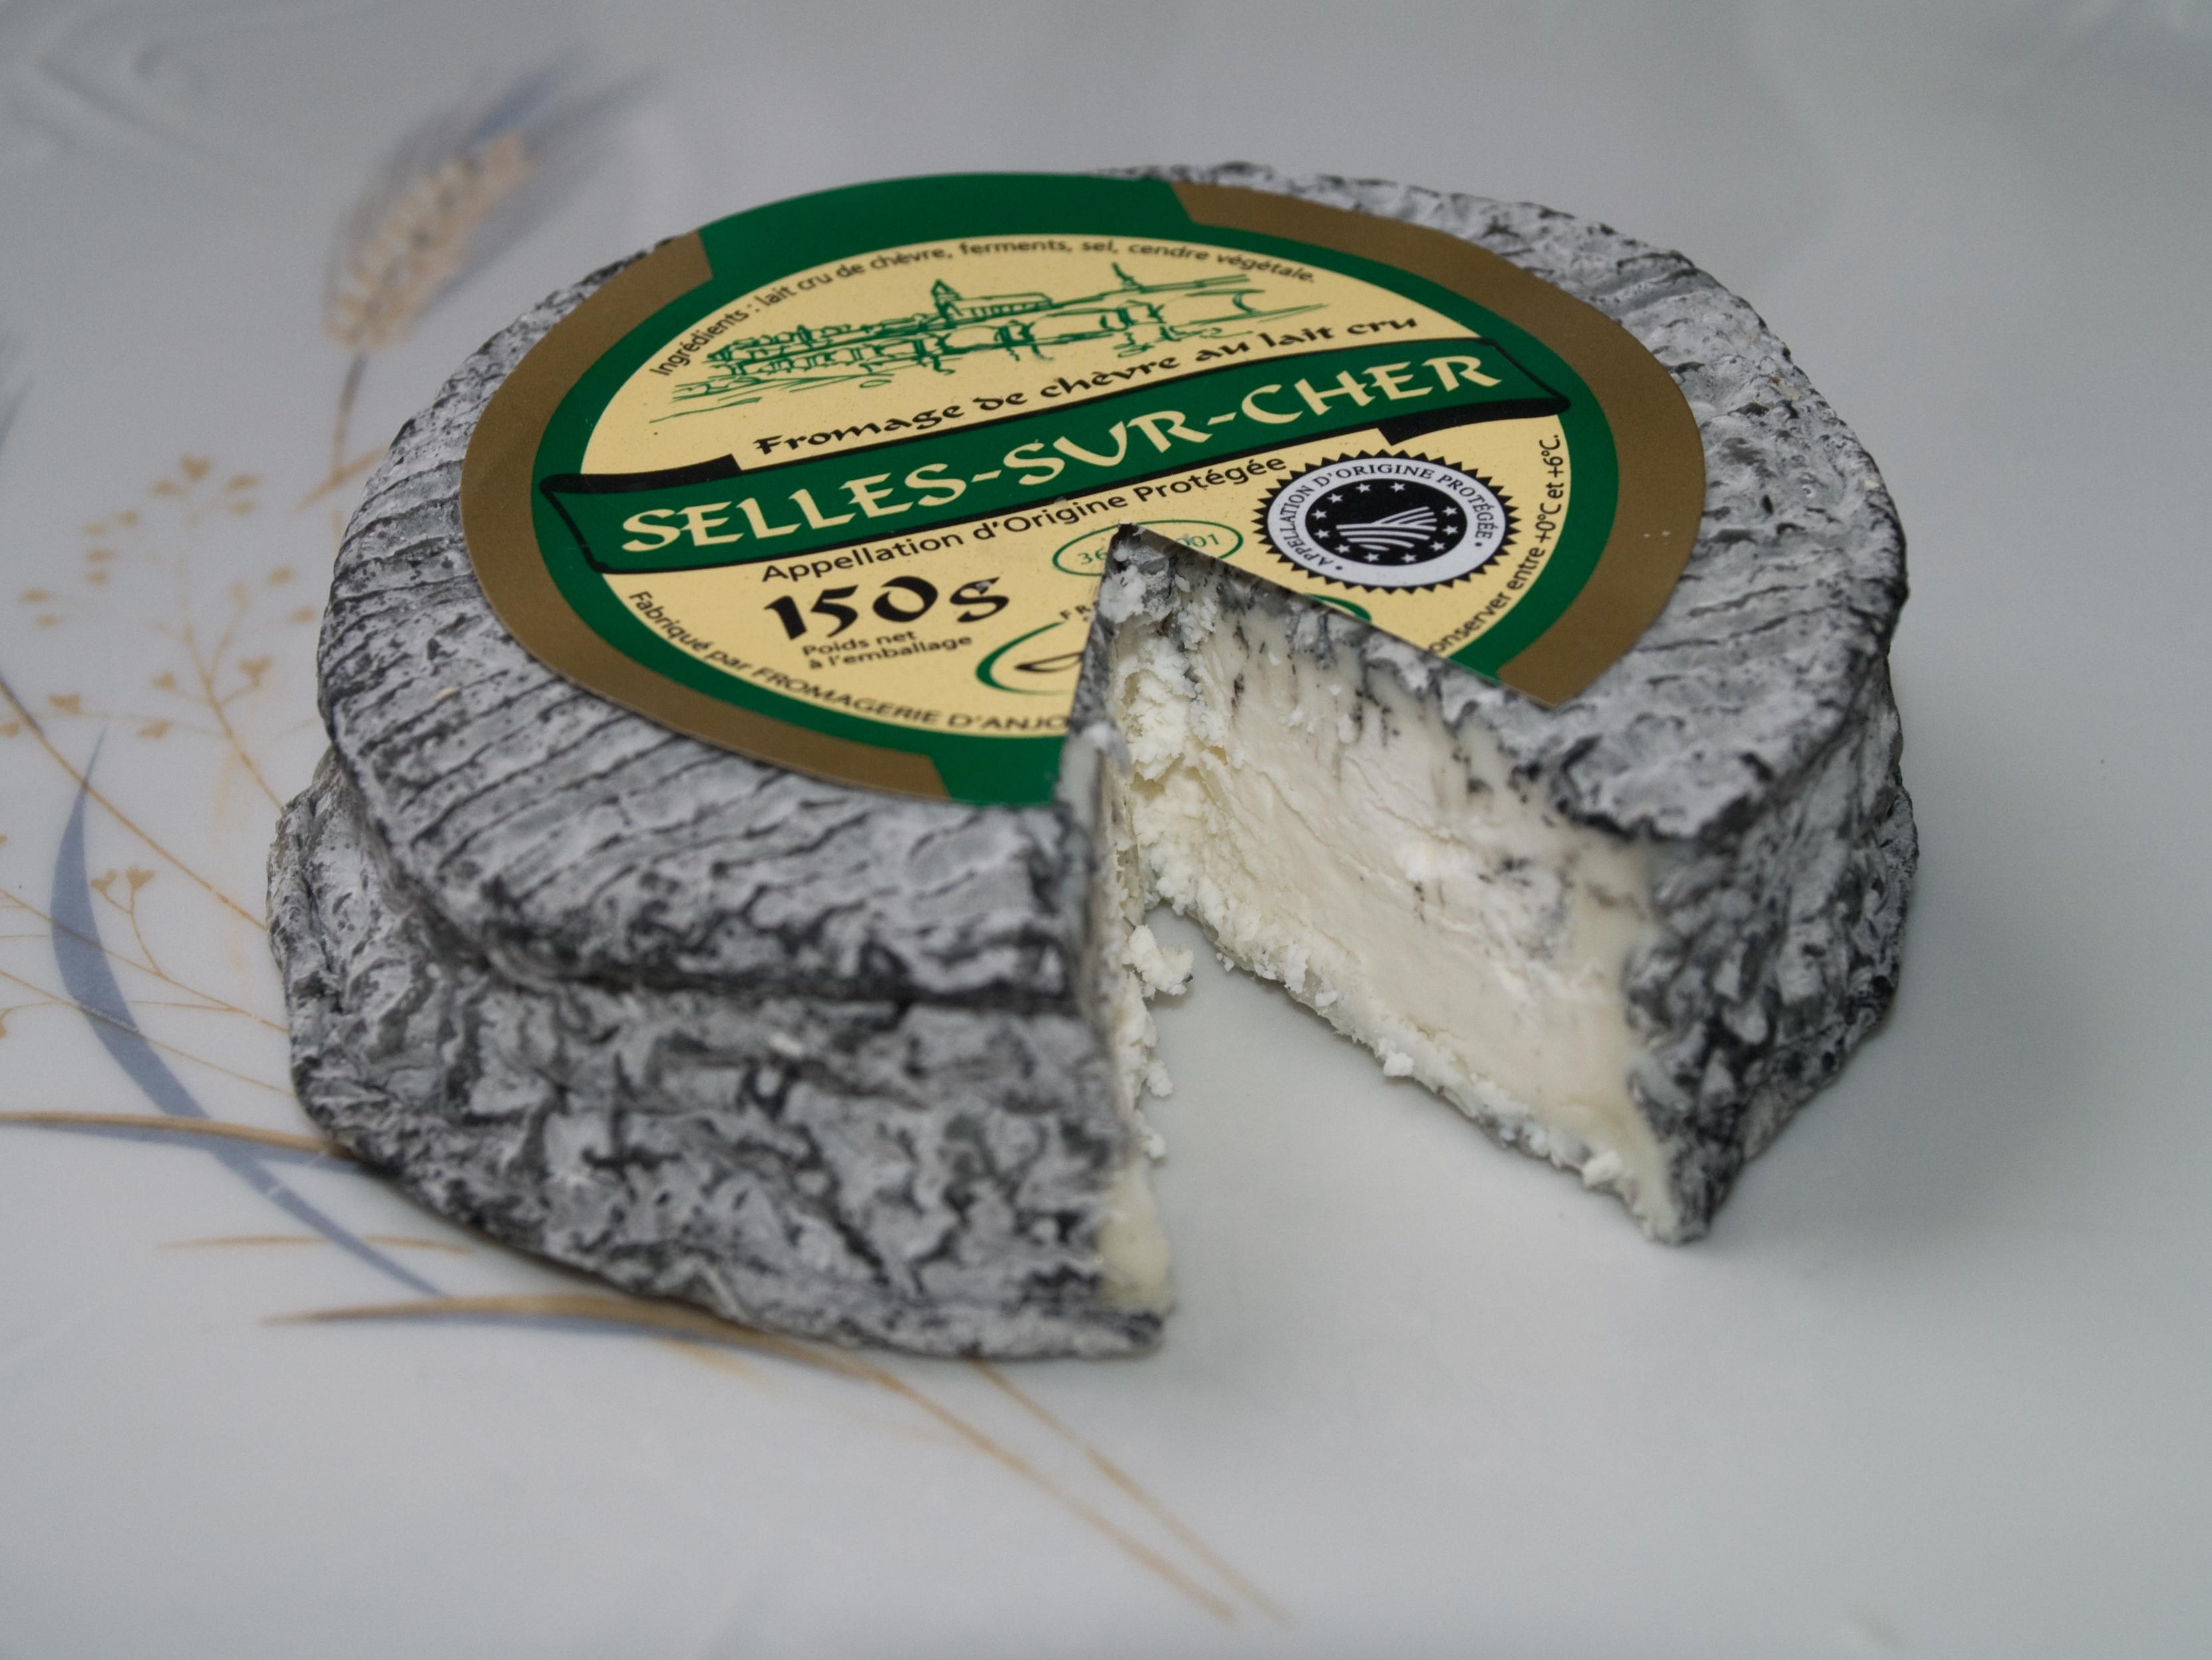 Fotos De Cher selles-sur-cher cheese - wikipedia